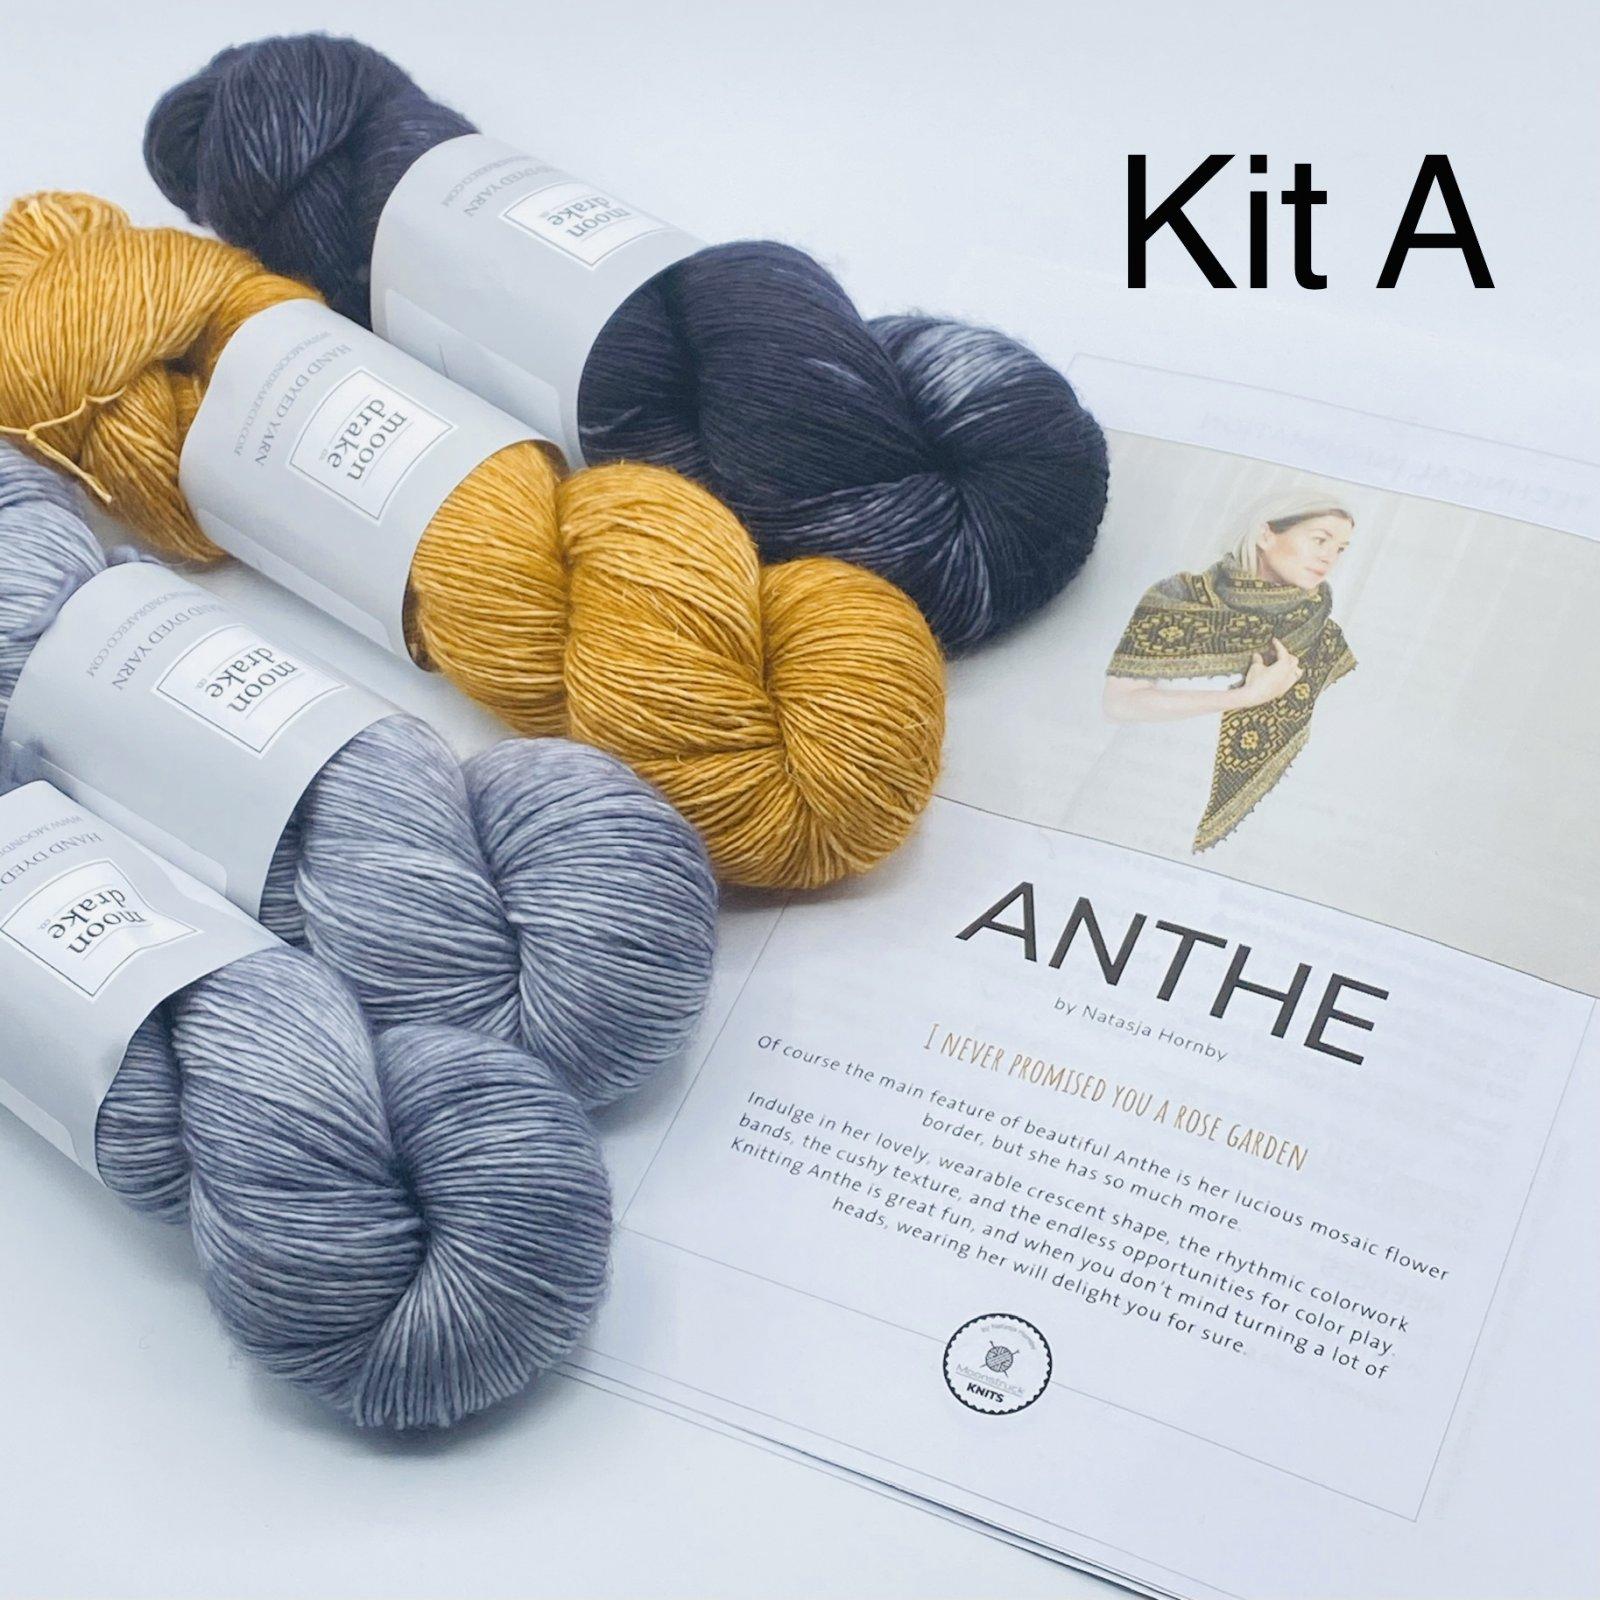 Anthe Shawl Kits